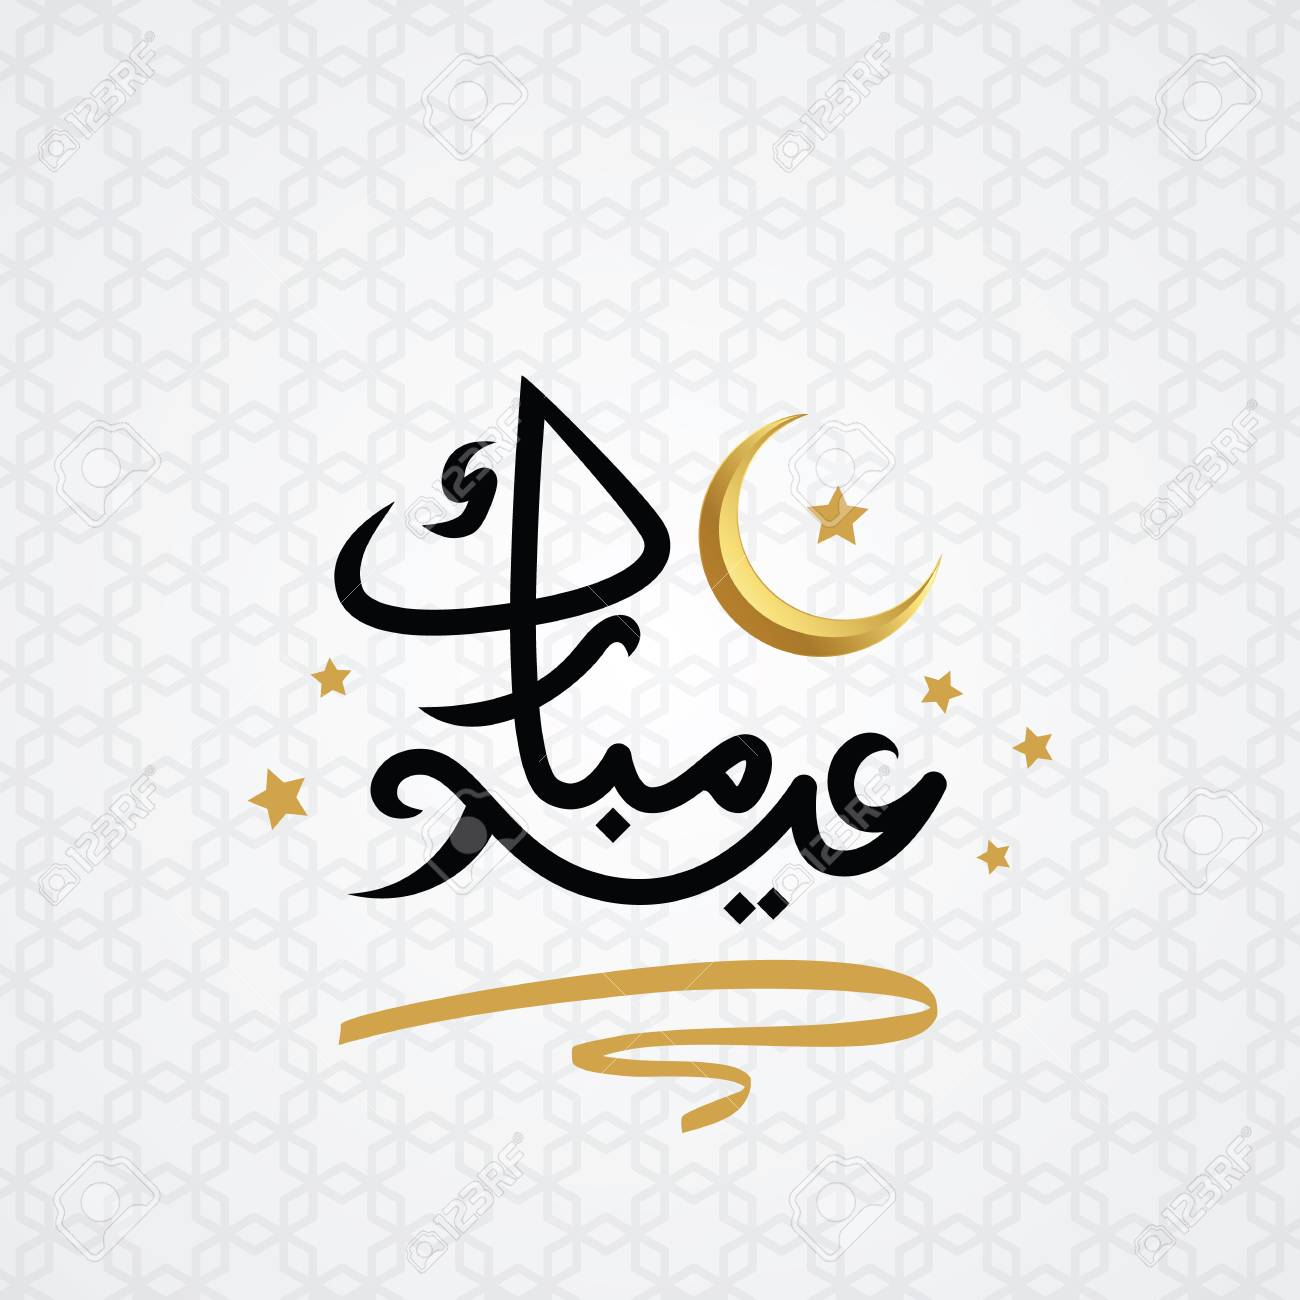 Eid Mubarak Islamic Design Crescent Moon And Arabic Calligraphy Royalty Free Cliparts Vectors And Stock Illustration Image 123440161